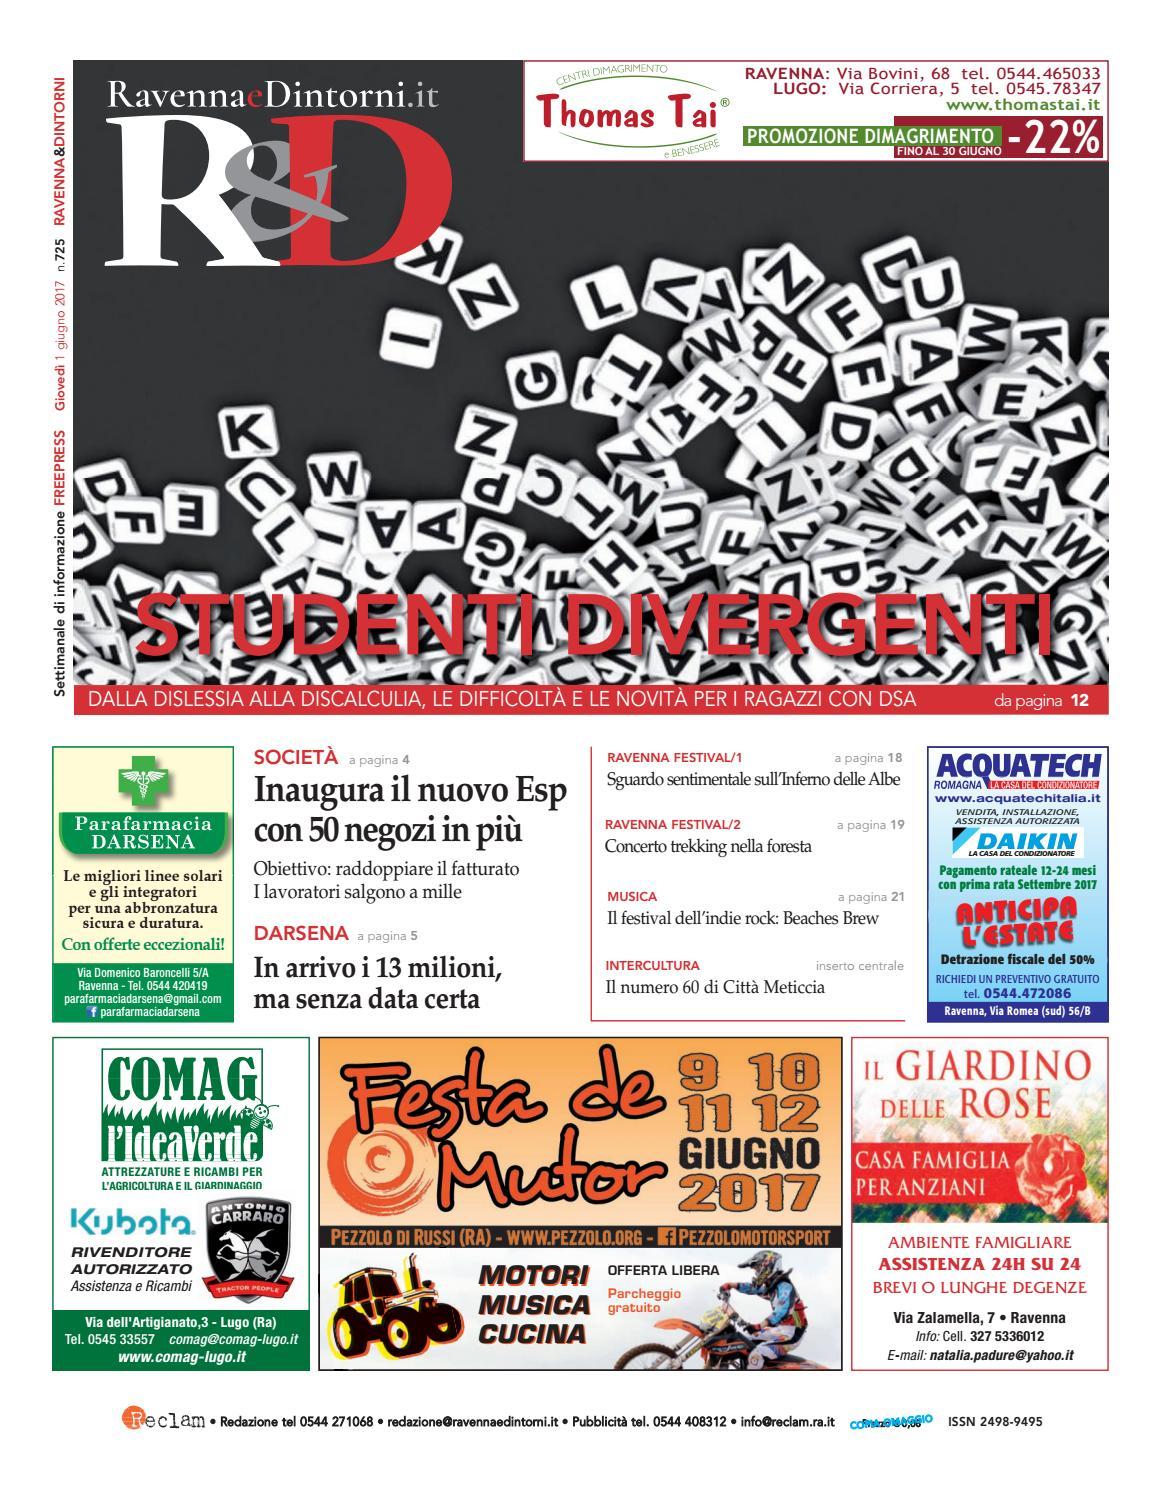 Rd 01 06 17 by Reclam Edizioni e Comunicazione issuu